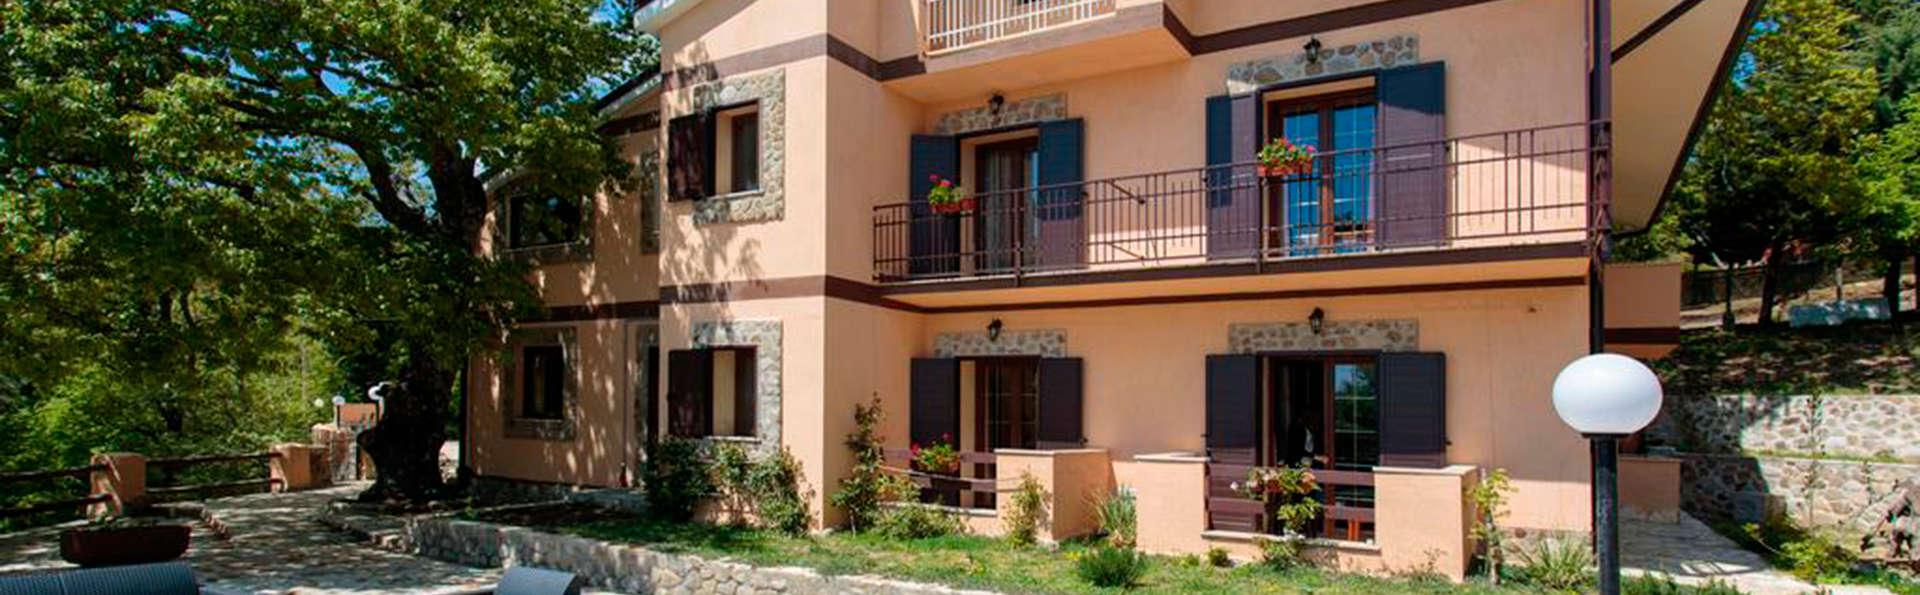 Dimora Tre Cancelli - EDIT_terrace.jpg